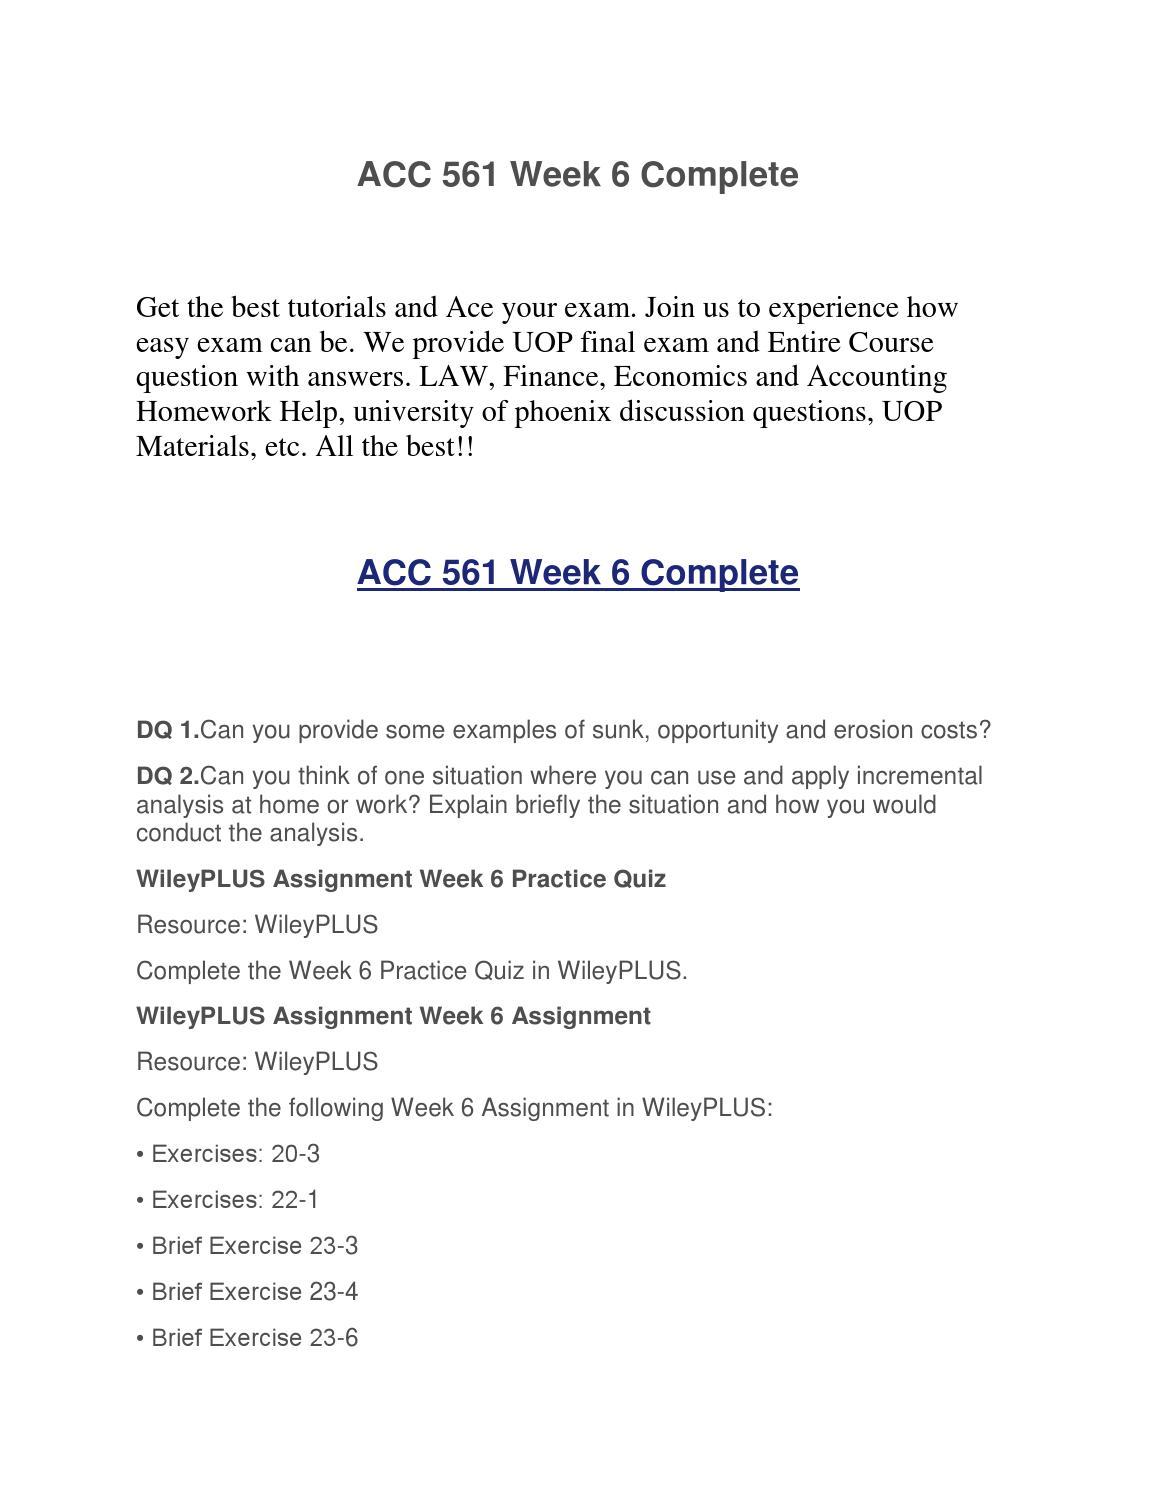 e23 2 wyco company week 6 wiley homework